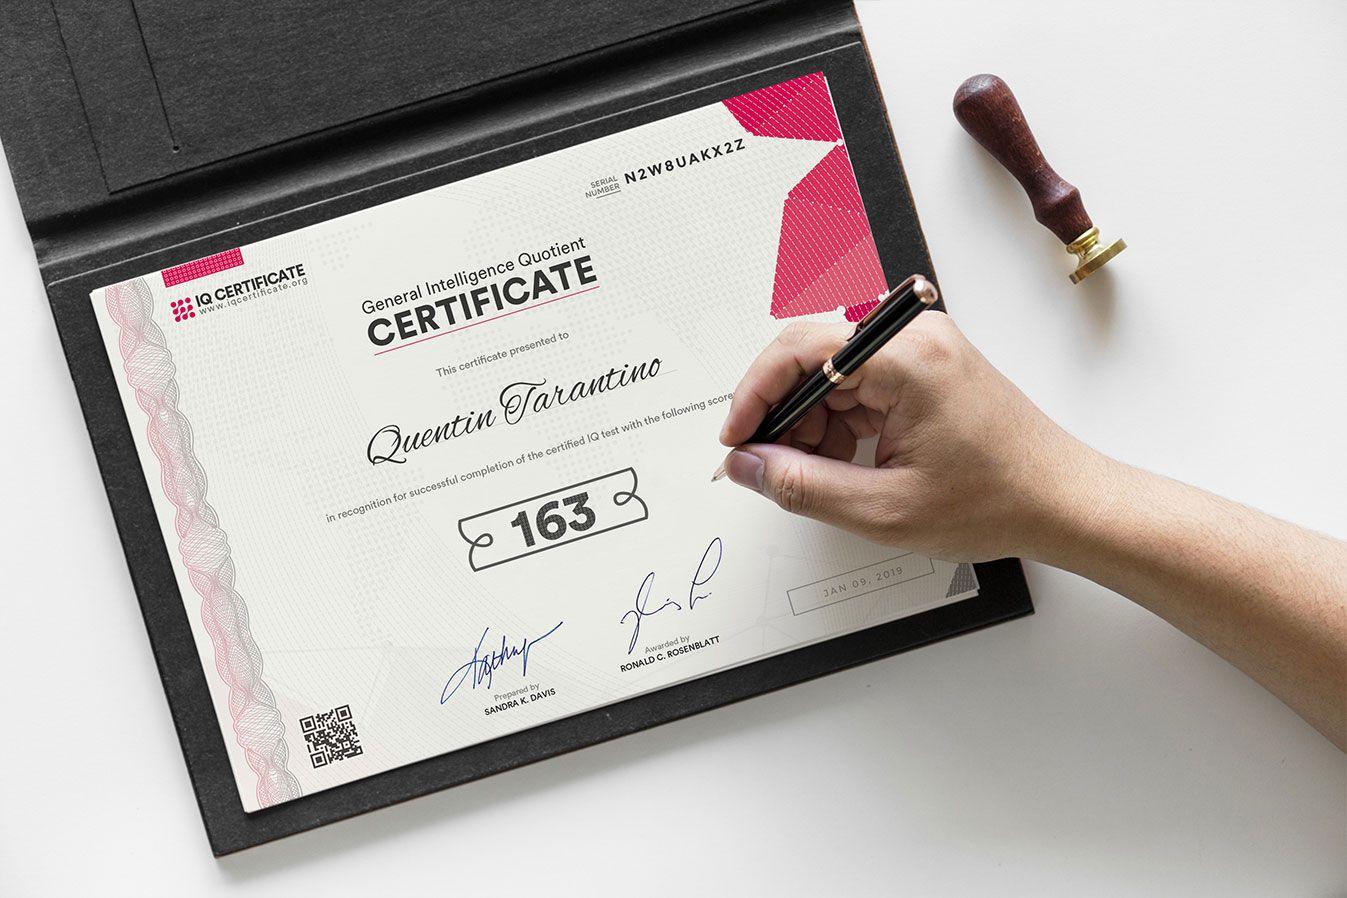 The Interesting Sample Iq Certificate Get Your Iq Certificate